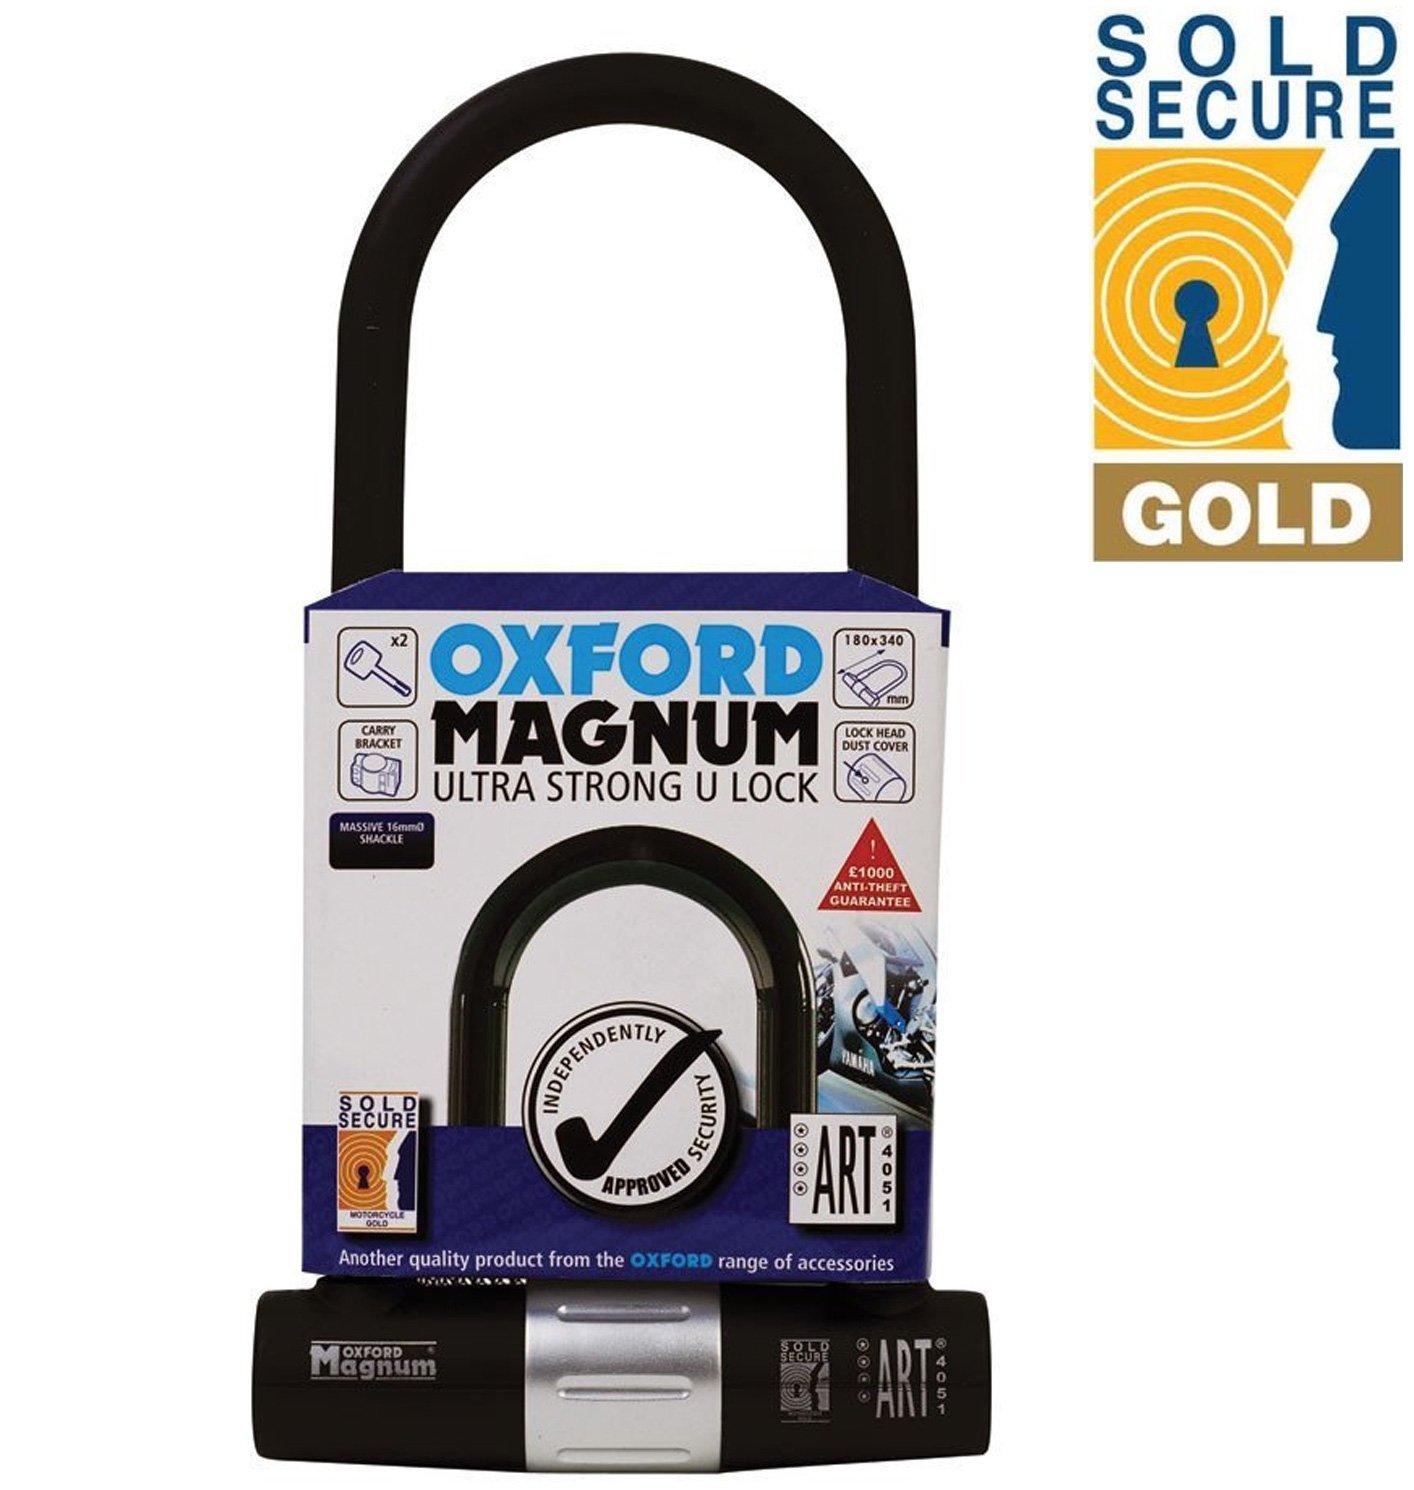 Oxford Magnum Ultra Strong Bike U Lock Sold Secure Gold Large